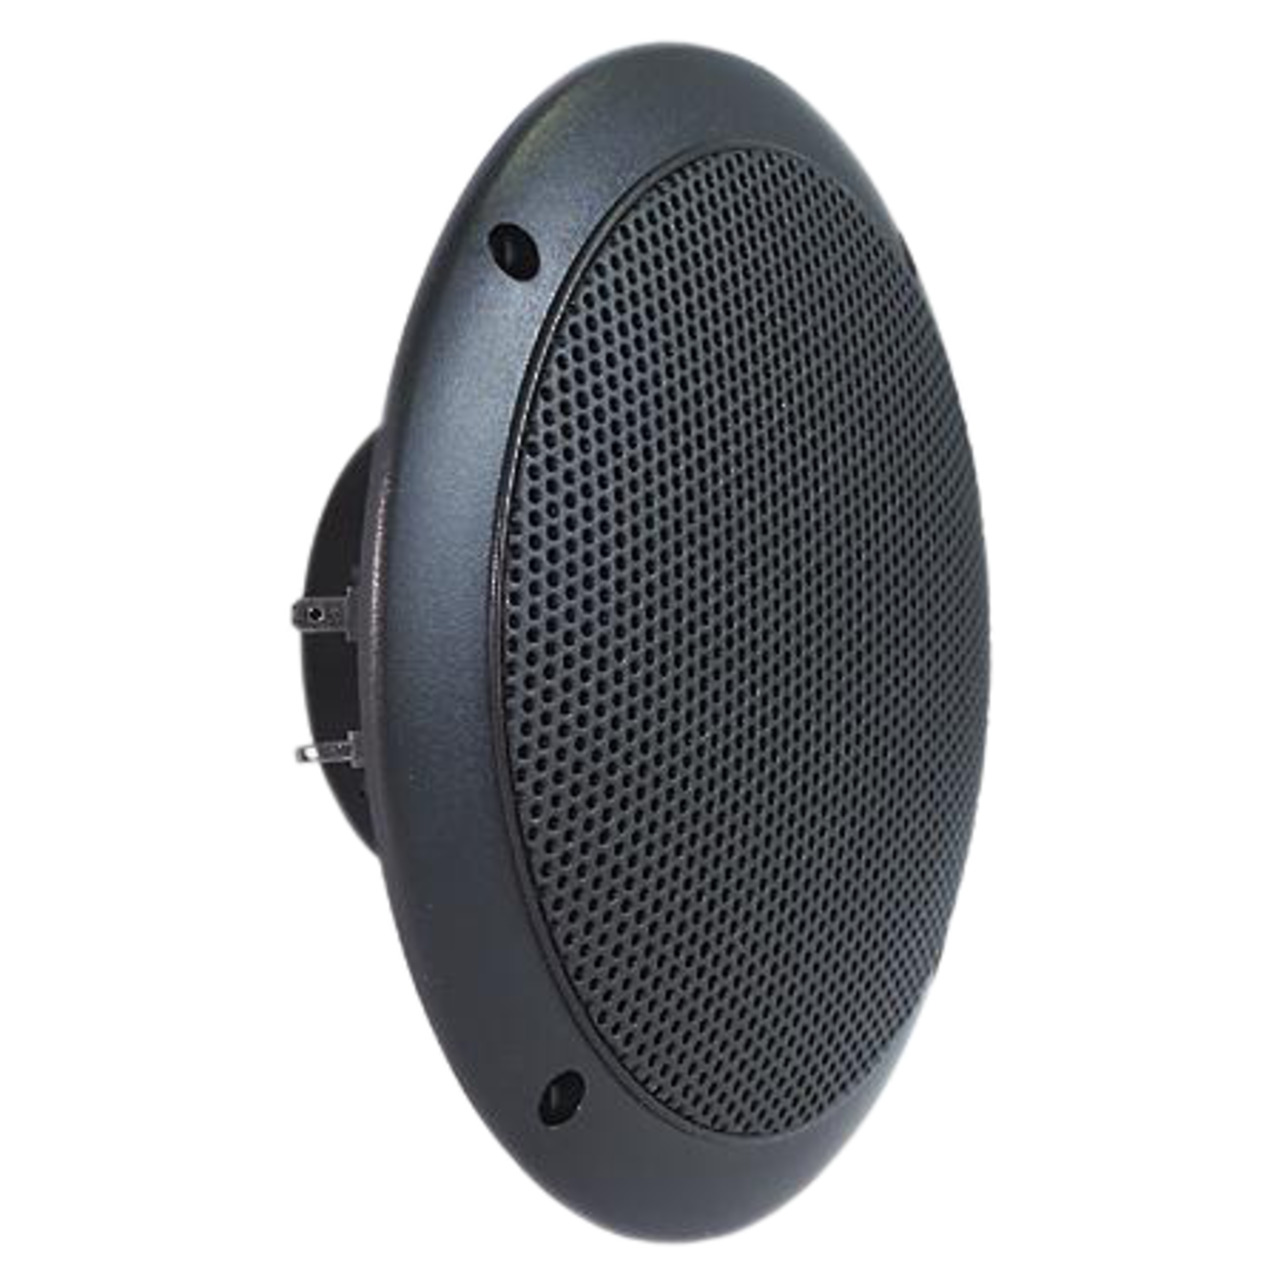 VISATON wasserfester Breitbandlautsprecher 16cm- FR 16 WP- schwarz - 4 Ohm